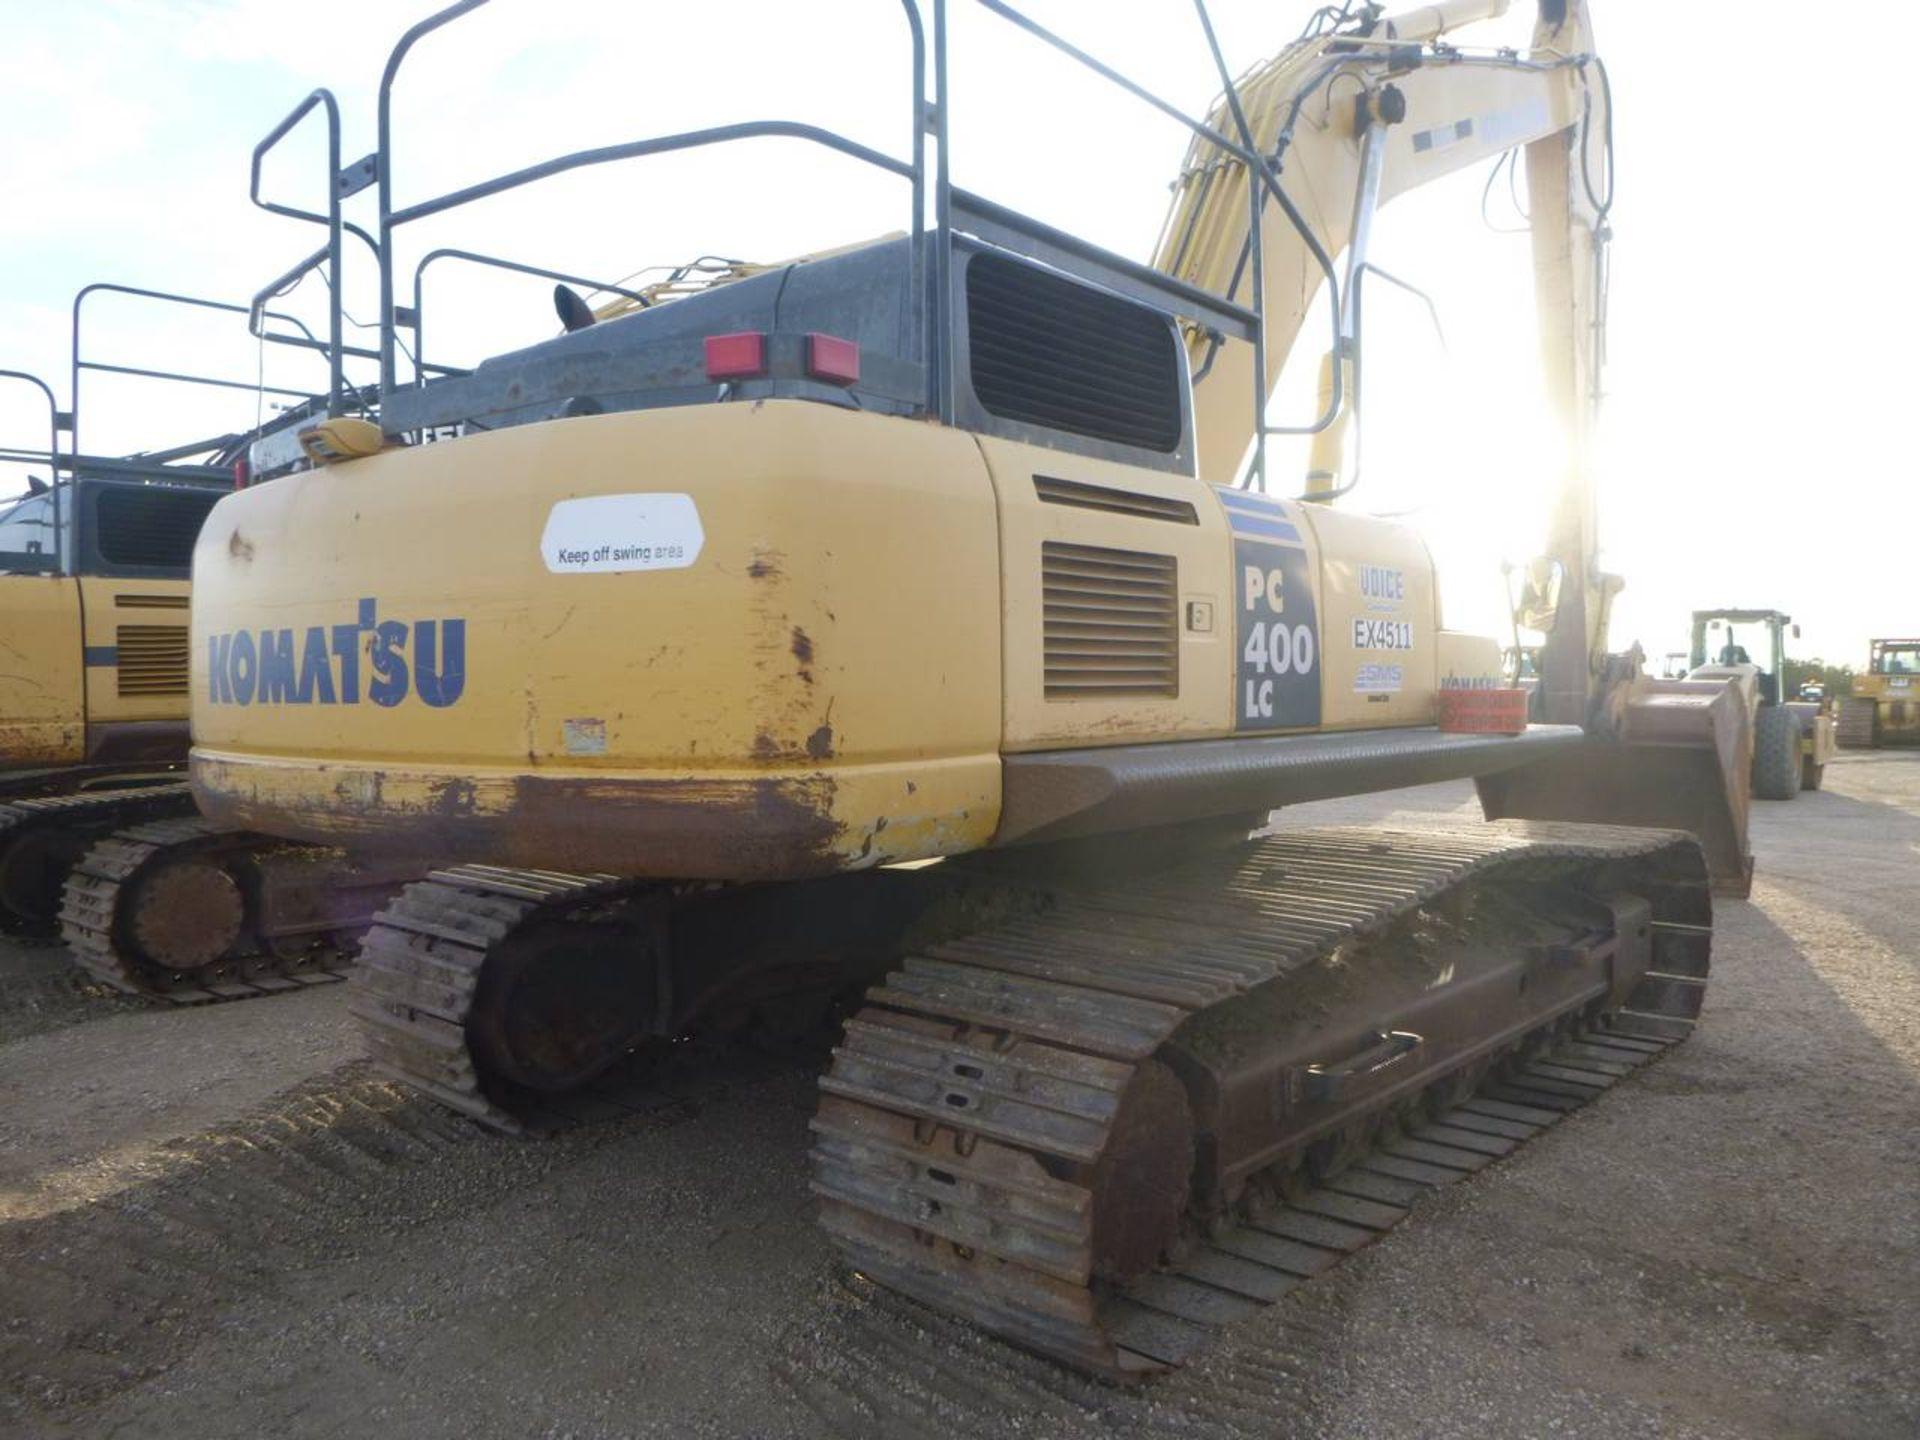 2008 Komatsu PC400LC-8 Excavator - Image 6 of 13